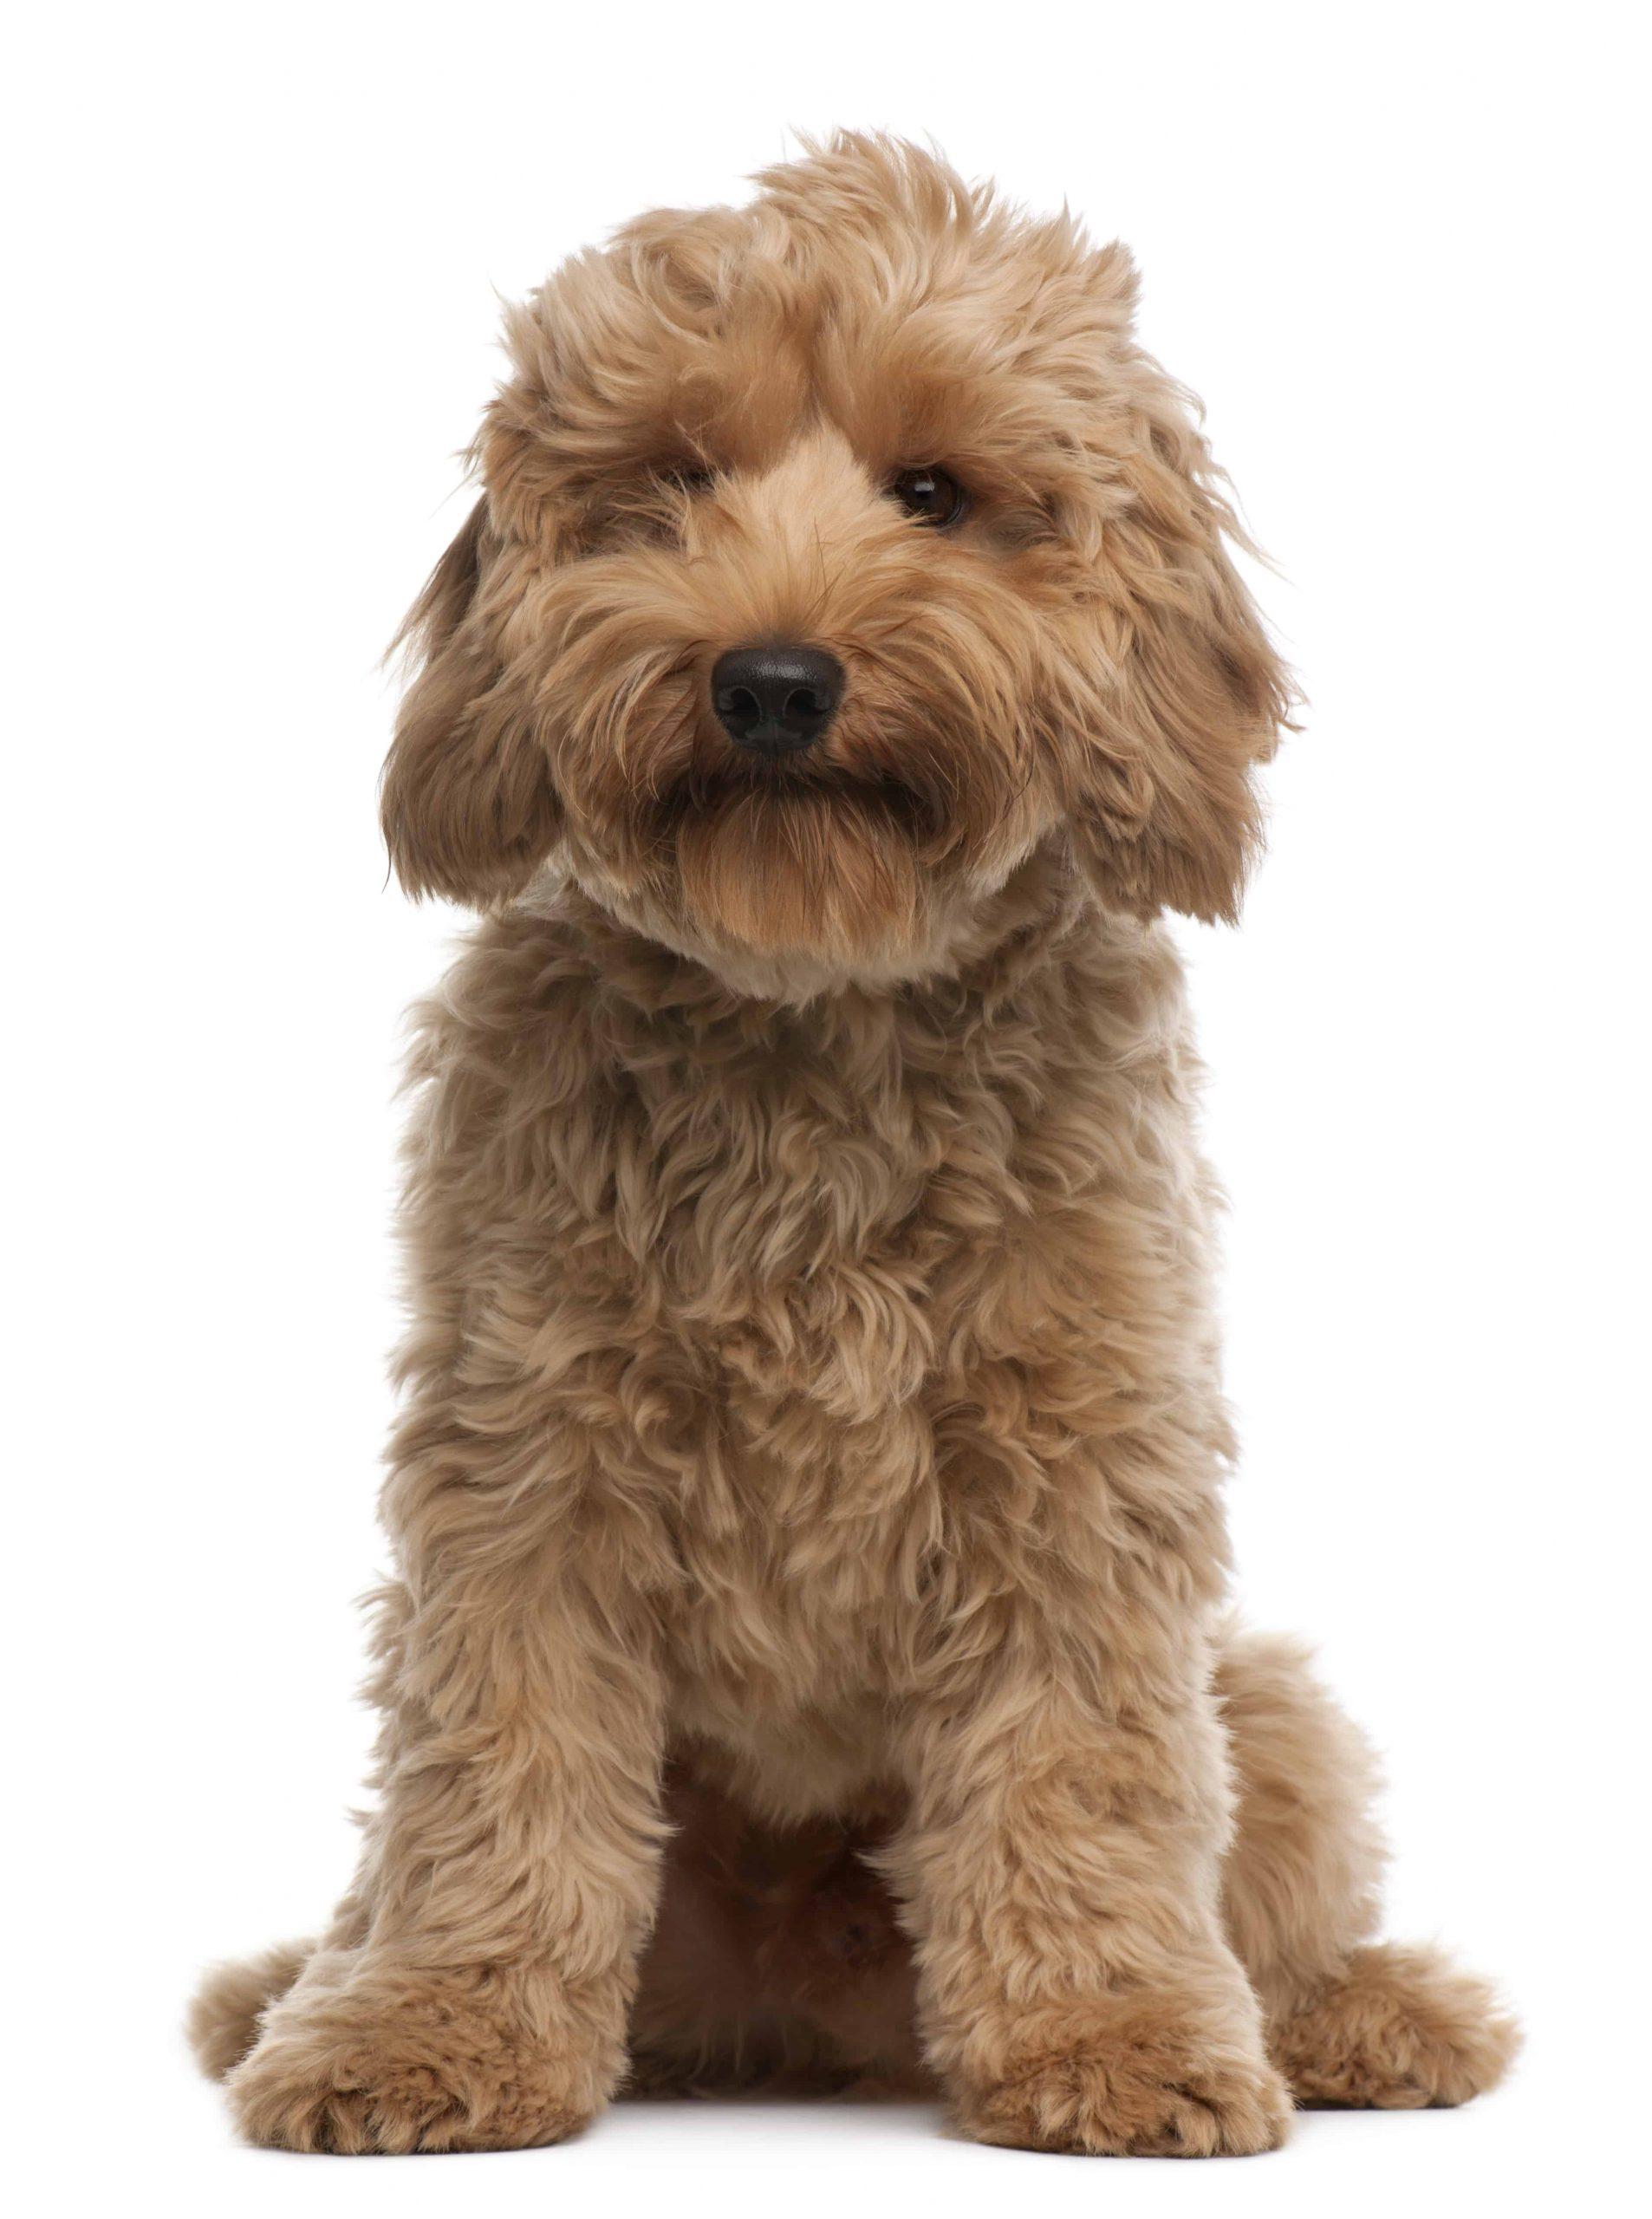 Cute cross breed dog